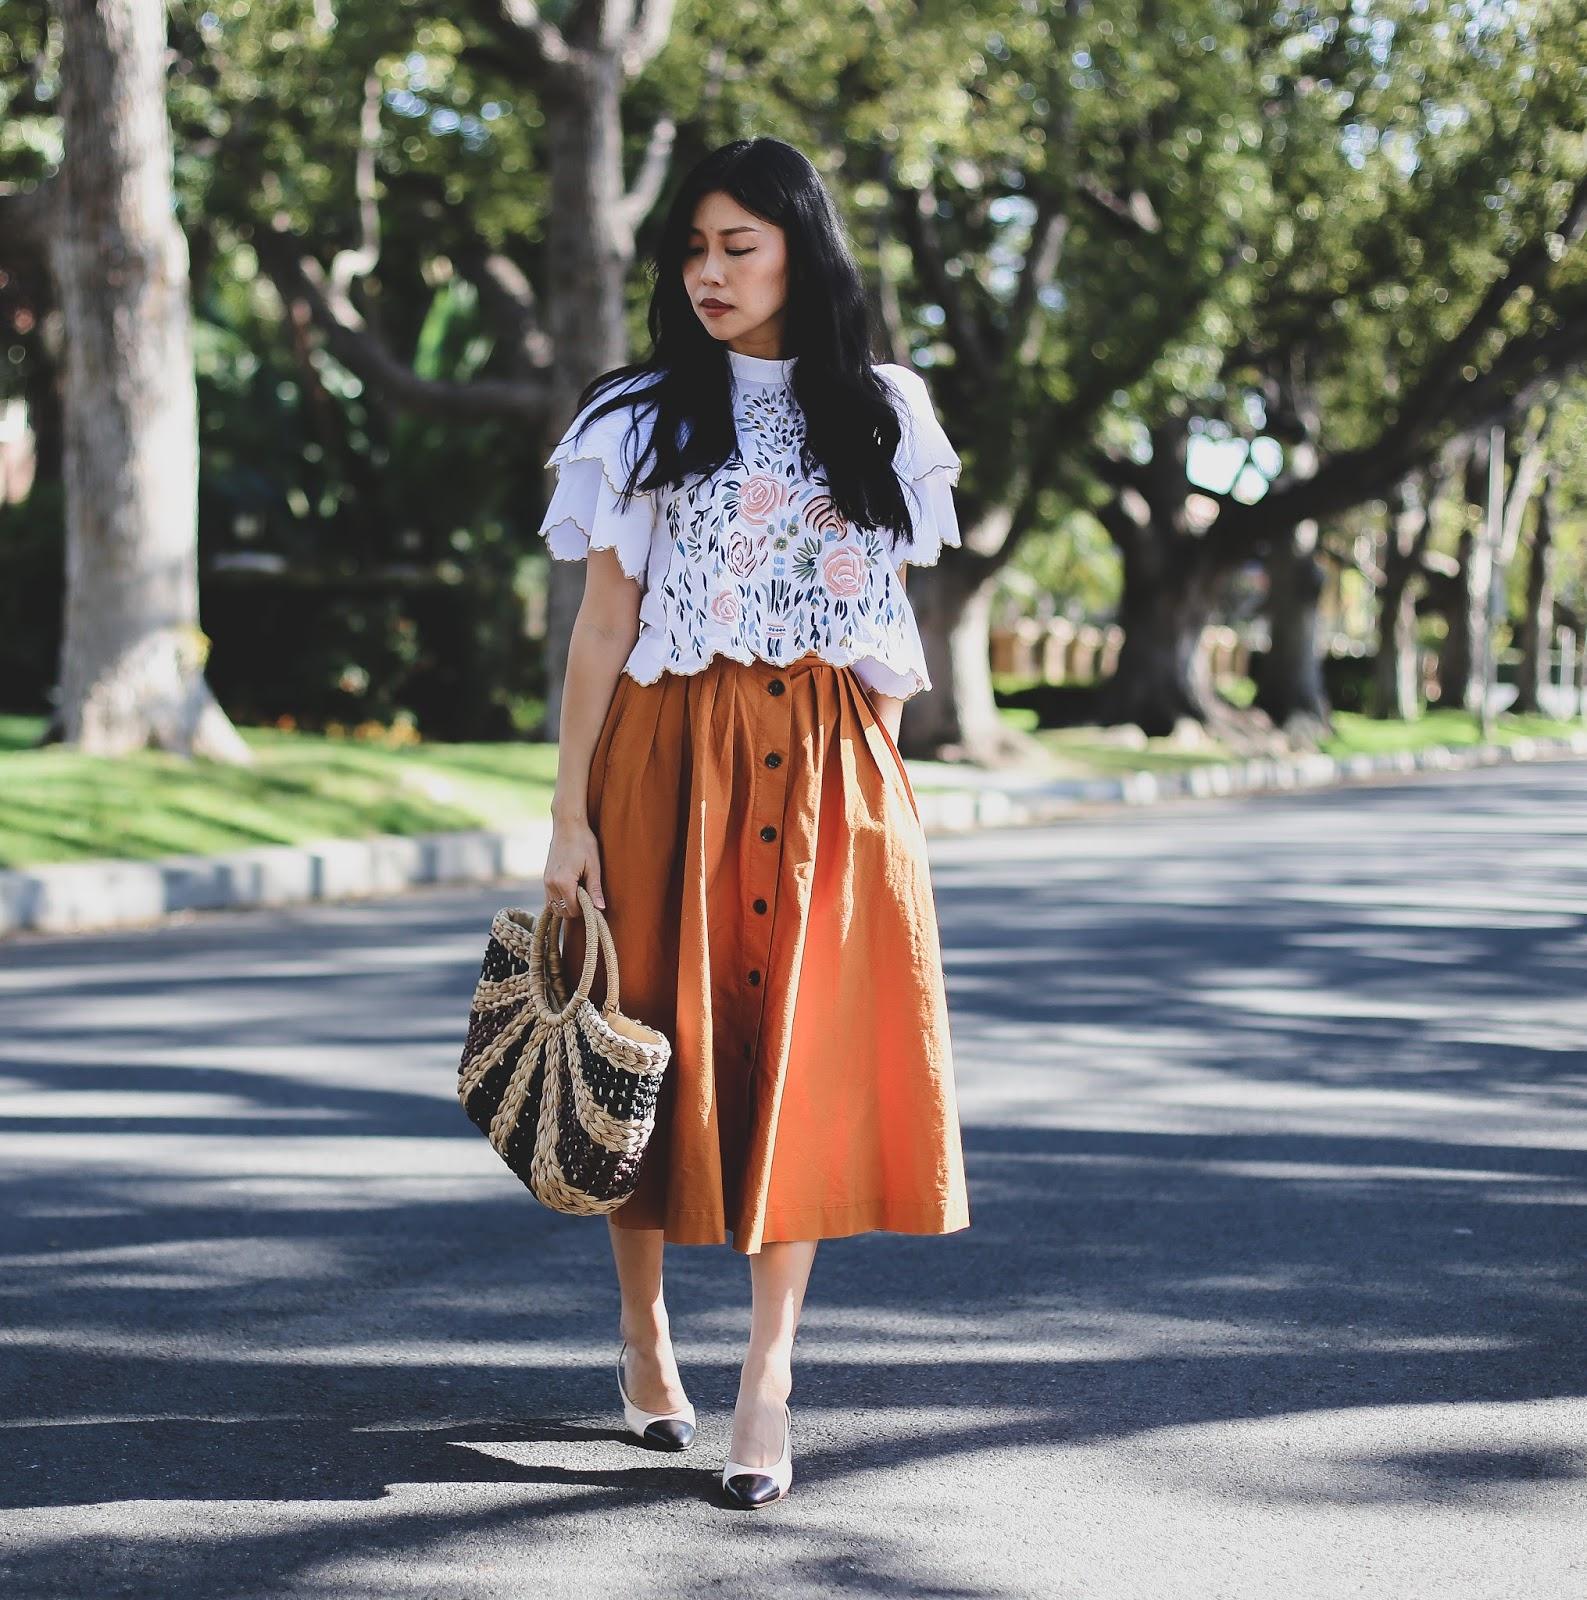 chanel slingbacks outfit